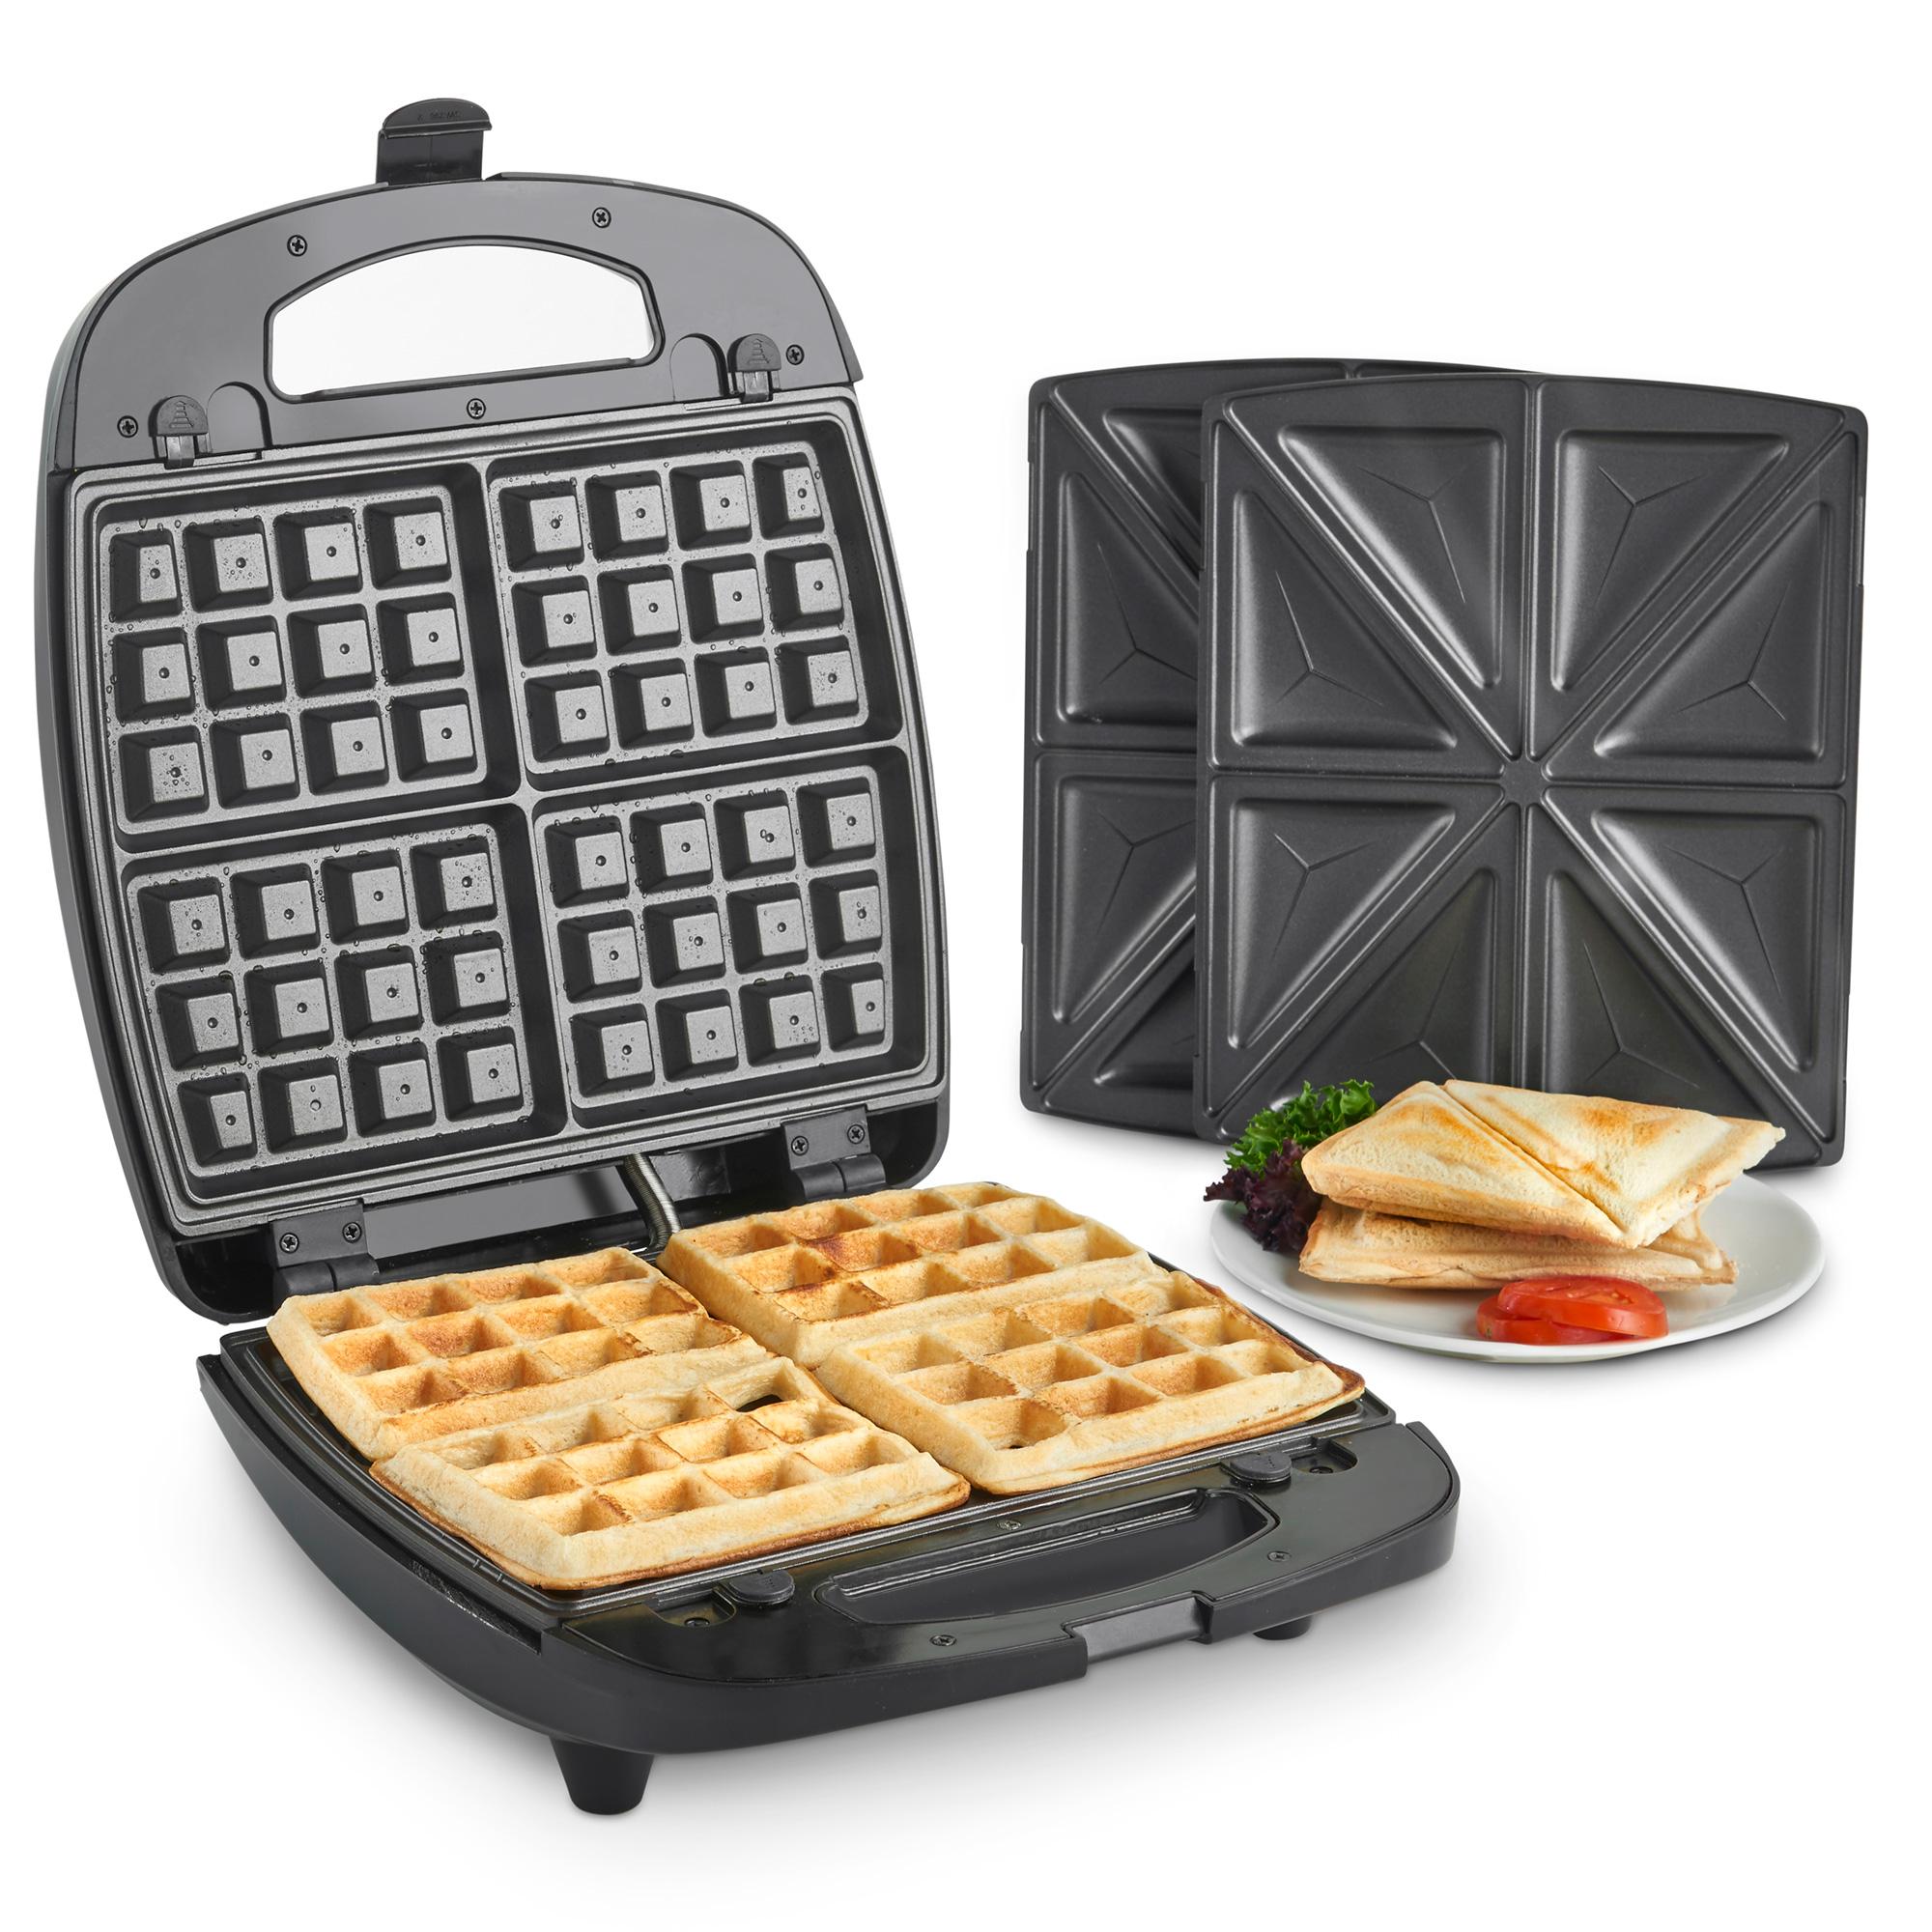 vonshef sandwich toaster waffle maker 2 in 1 toastie. Black Bedroom Furniture Sets. Home Design Ideas